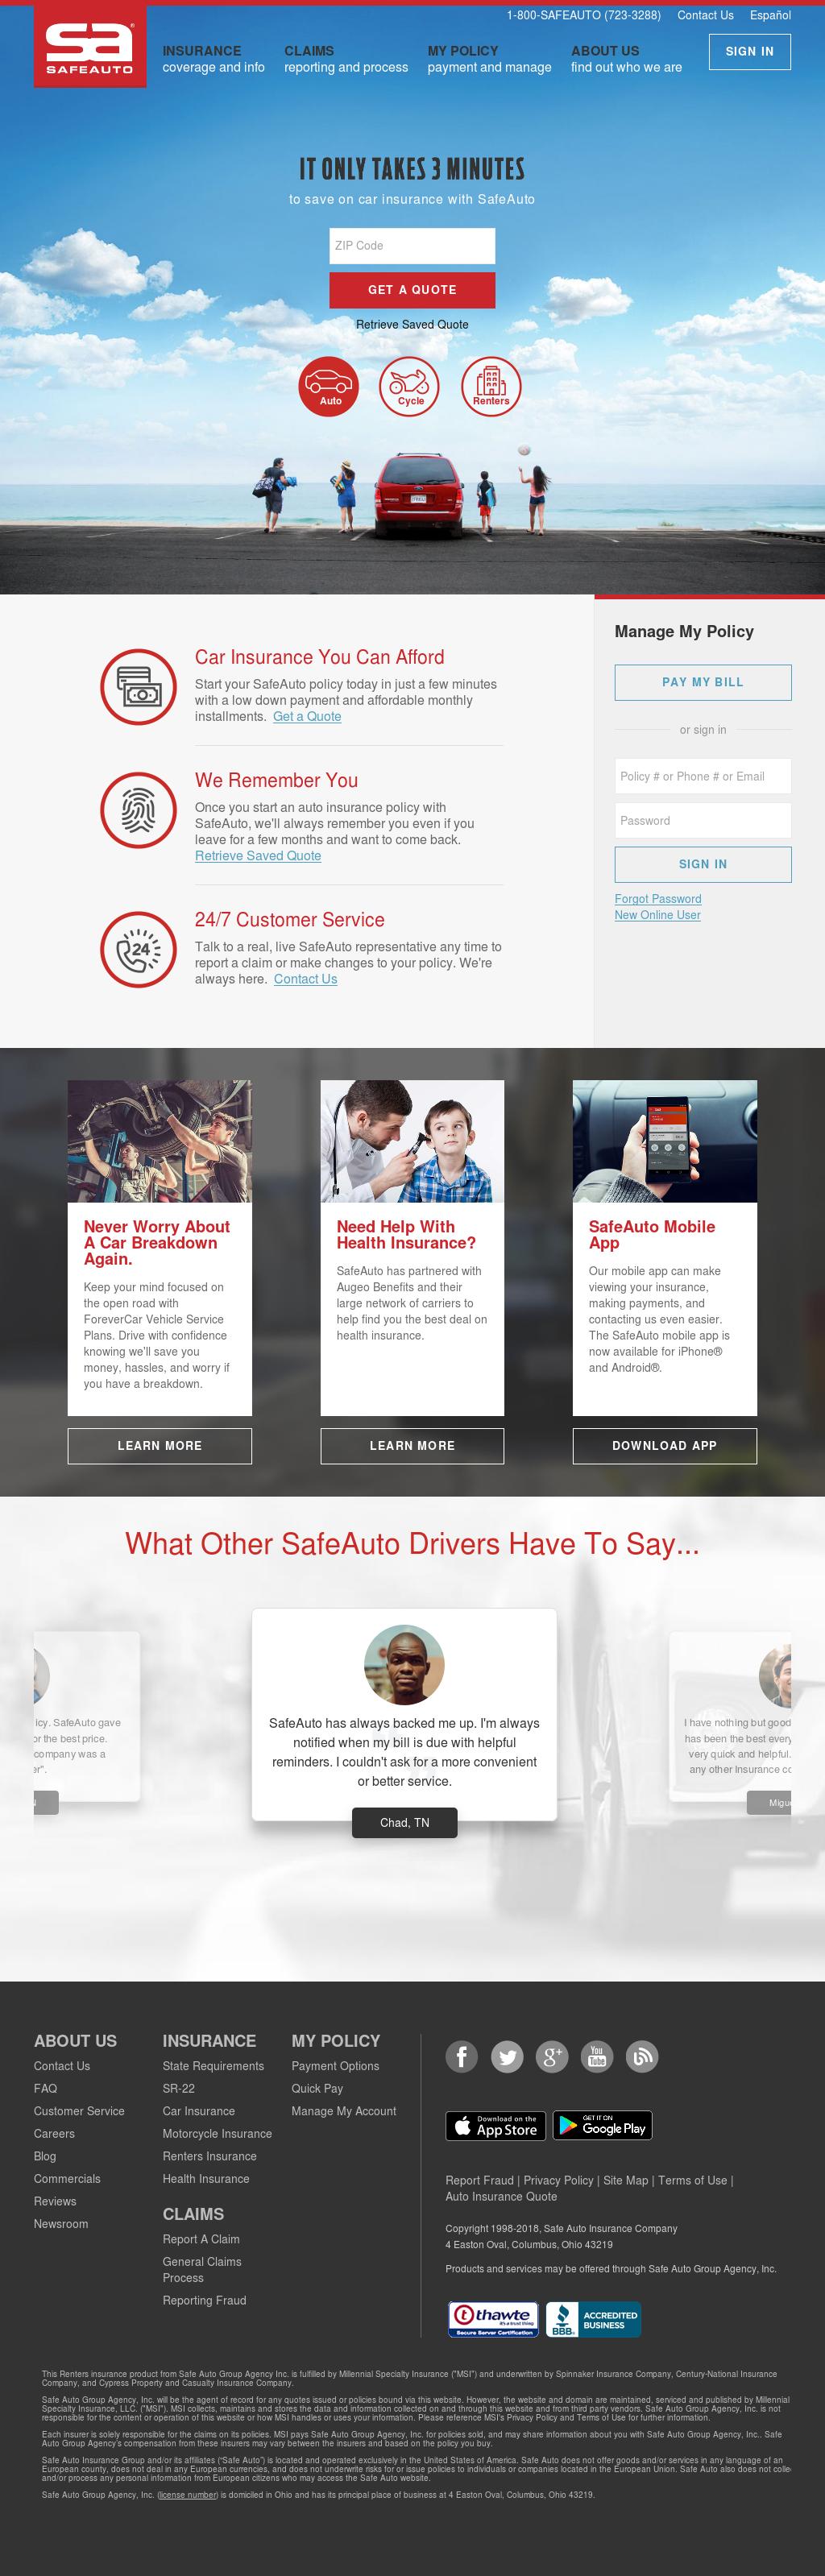 Safe Auto Customer Service >> Safe Auto Competitors Revenue And Employees Owler Company Profile